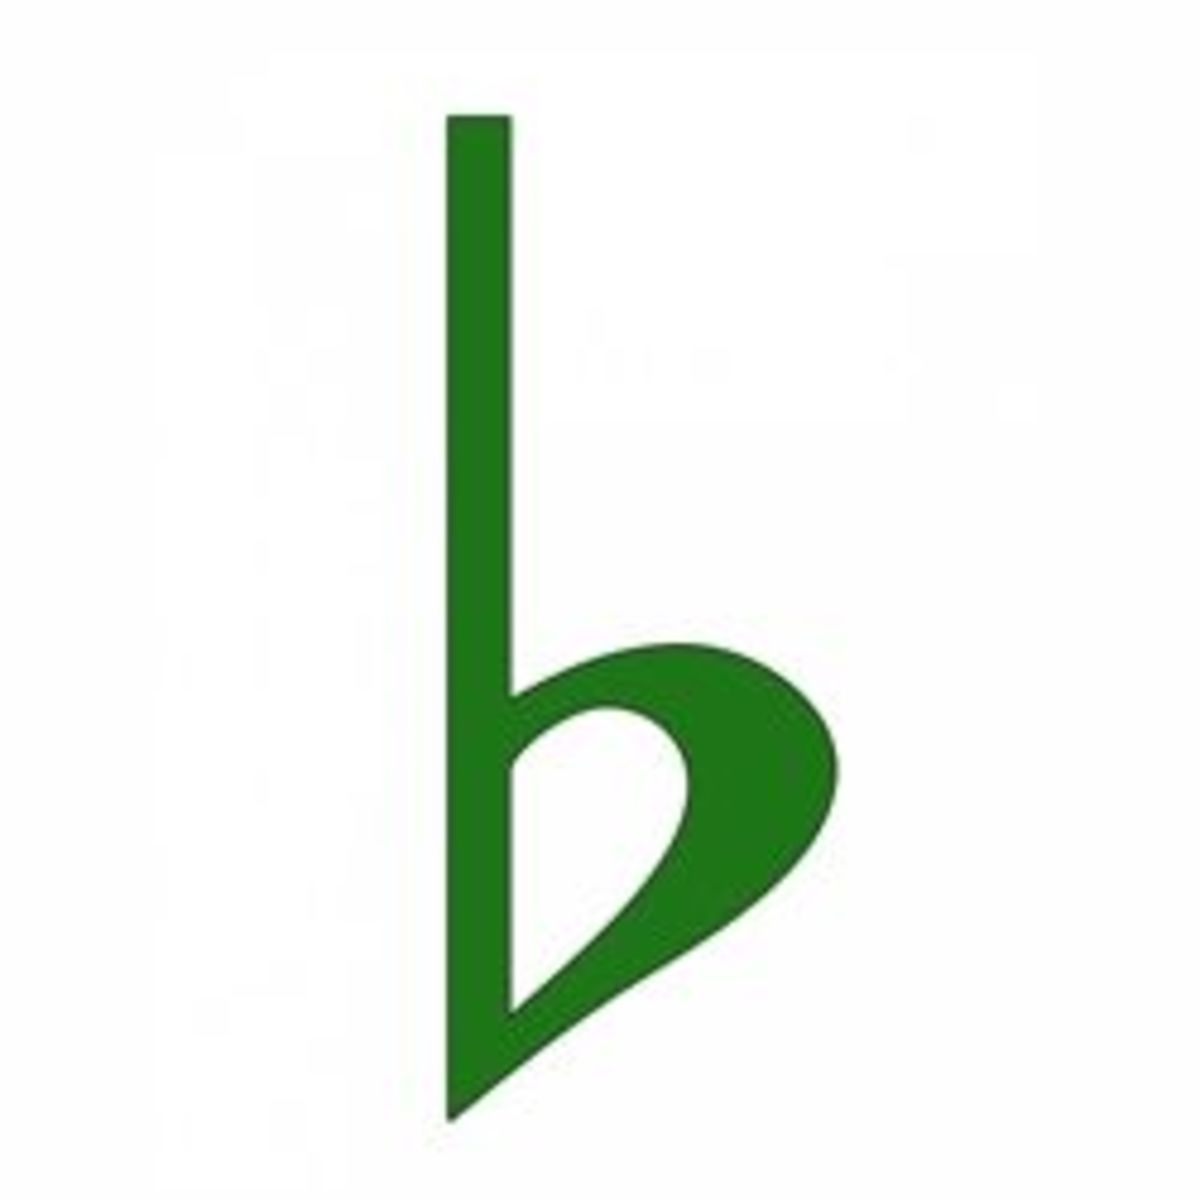 Free Music Clip Art - Flat Symbol